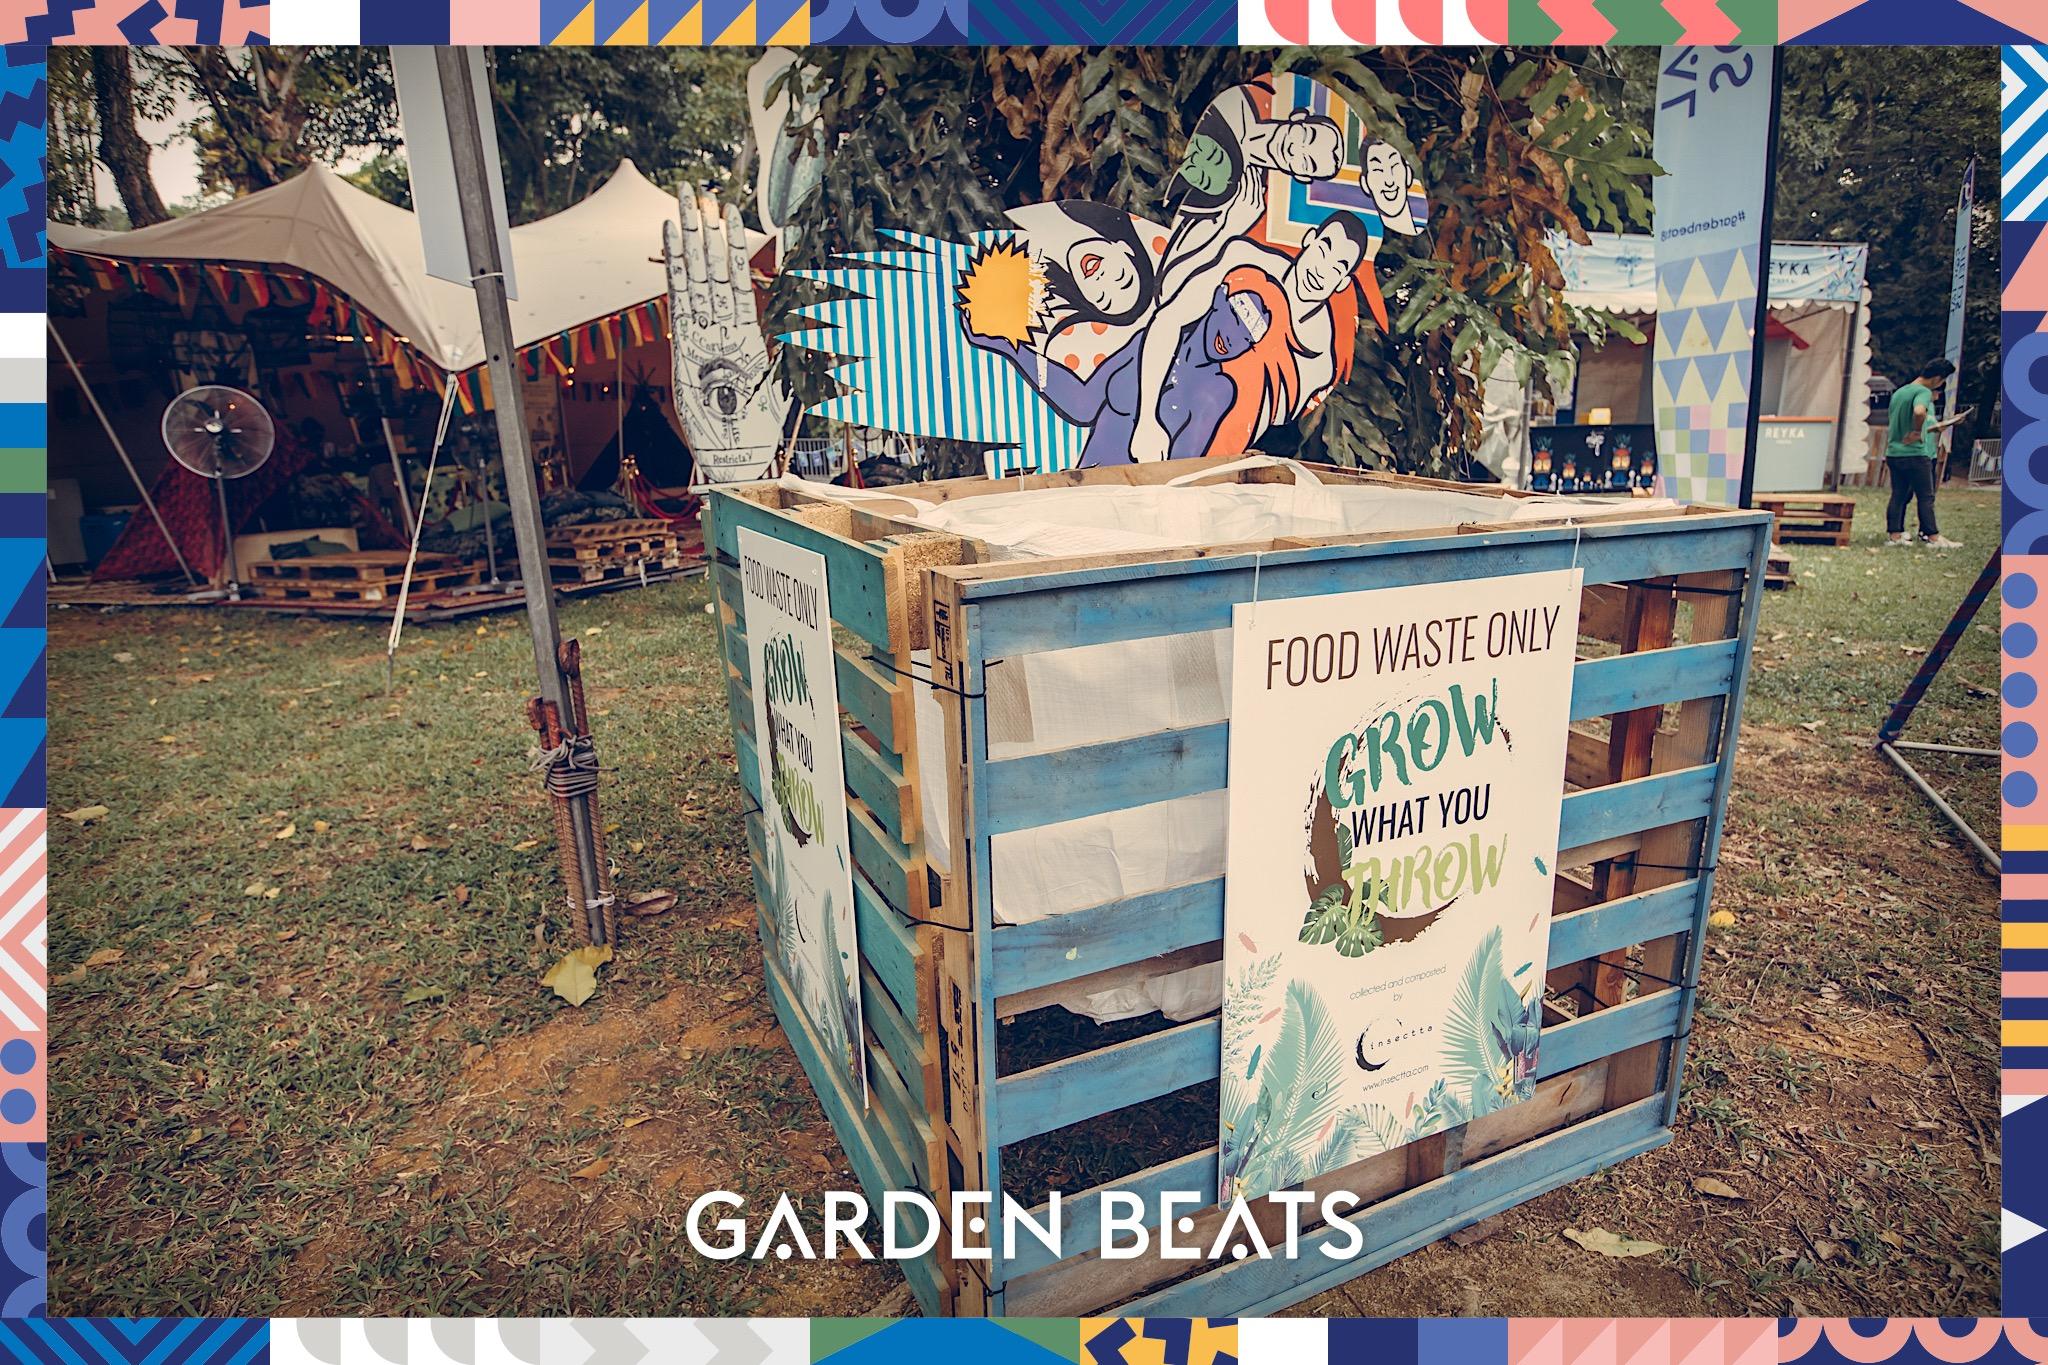 03032018_GardenBeats_Colossal026_Watermarked.jpg